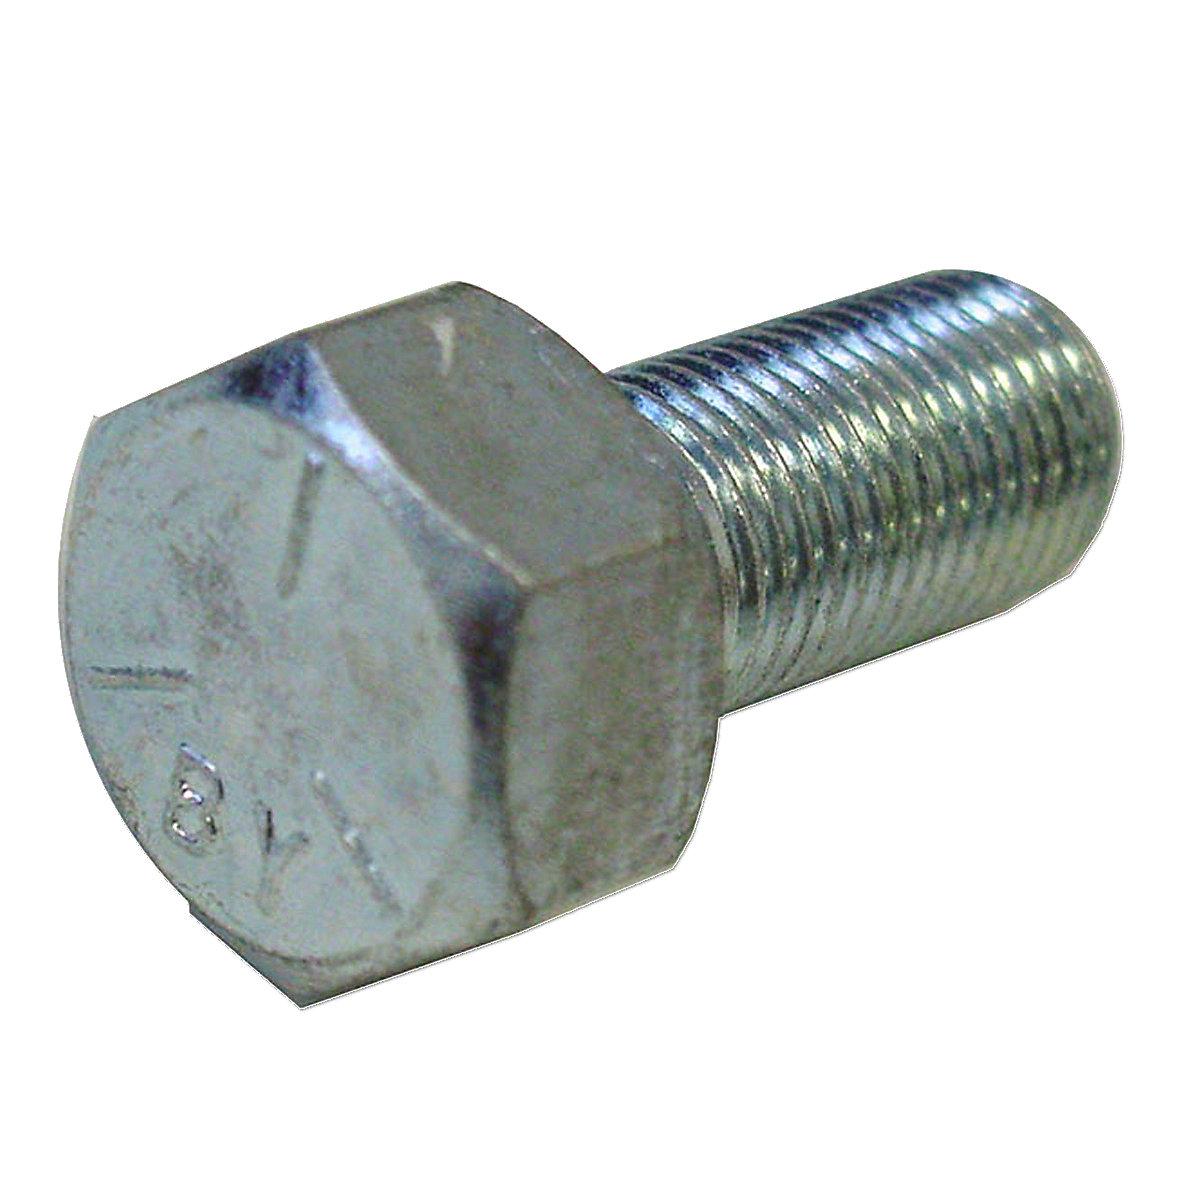 Rear Wheel Lug Bolt (1/2-20 NF, 7/8 Thread Length, 13/16 Hex Head)